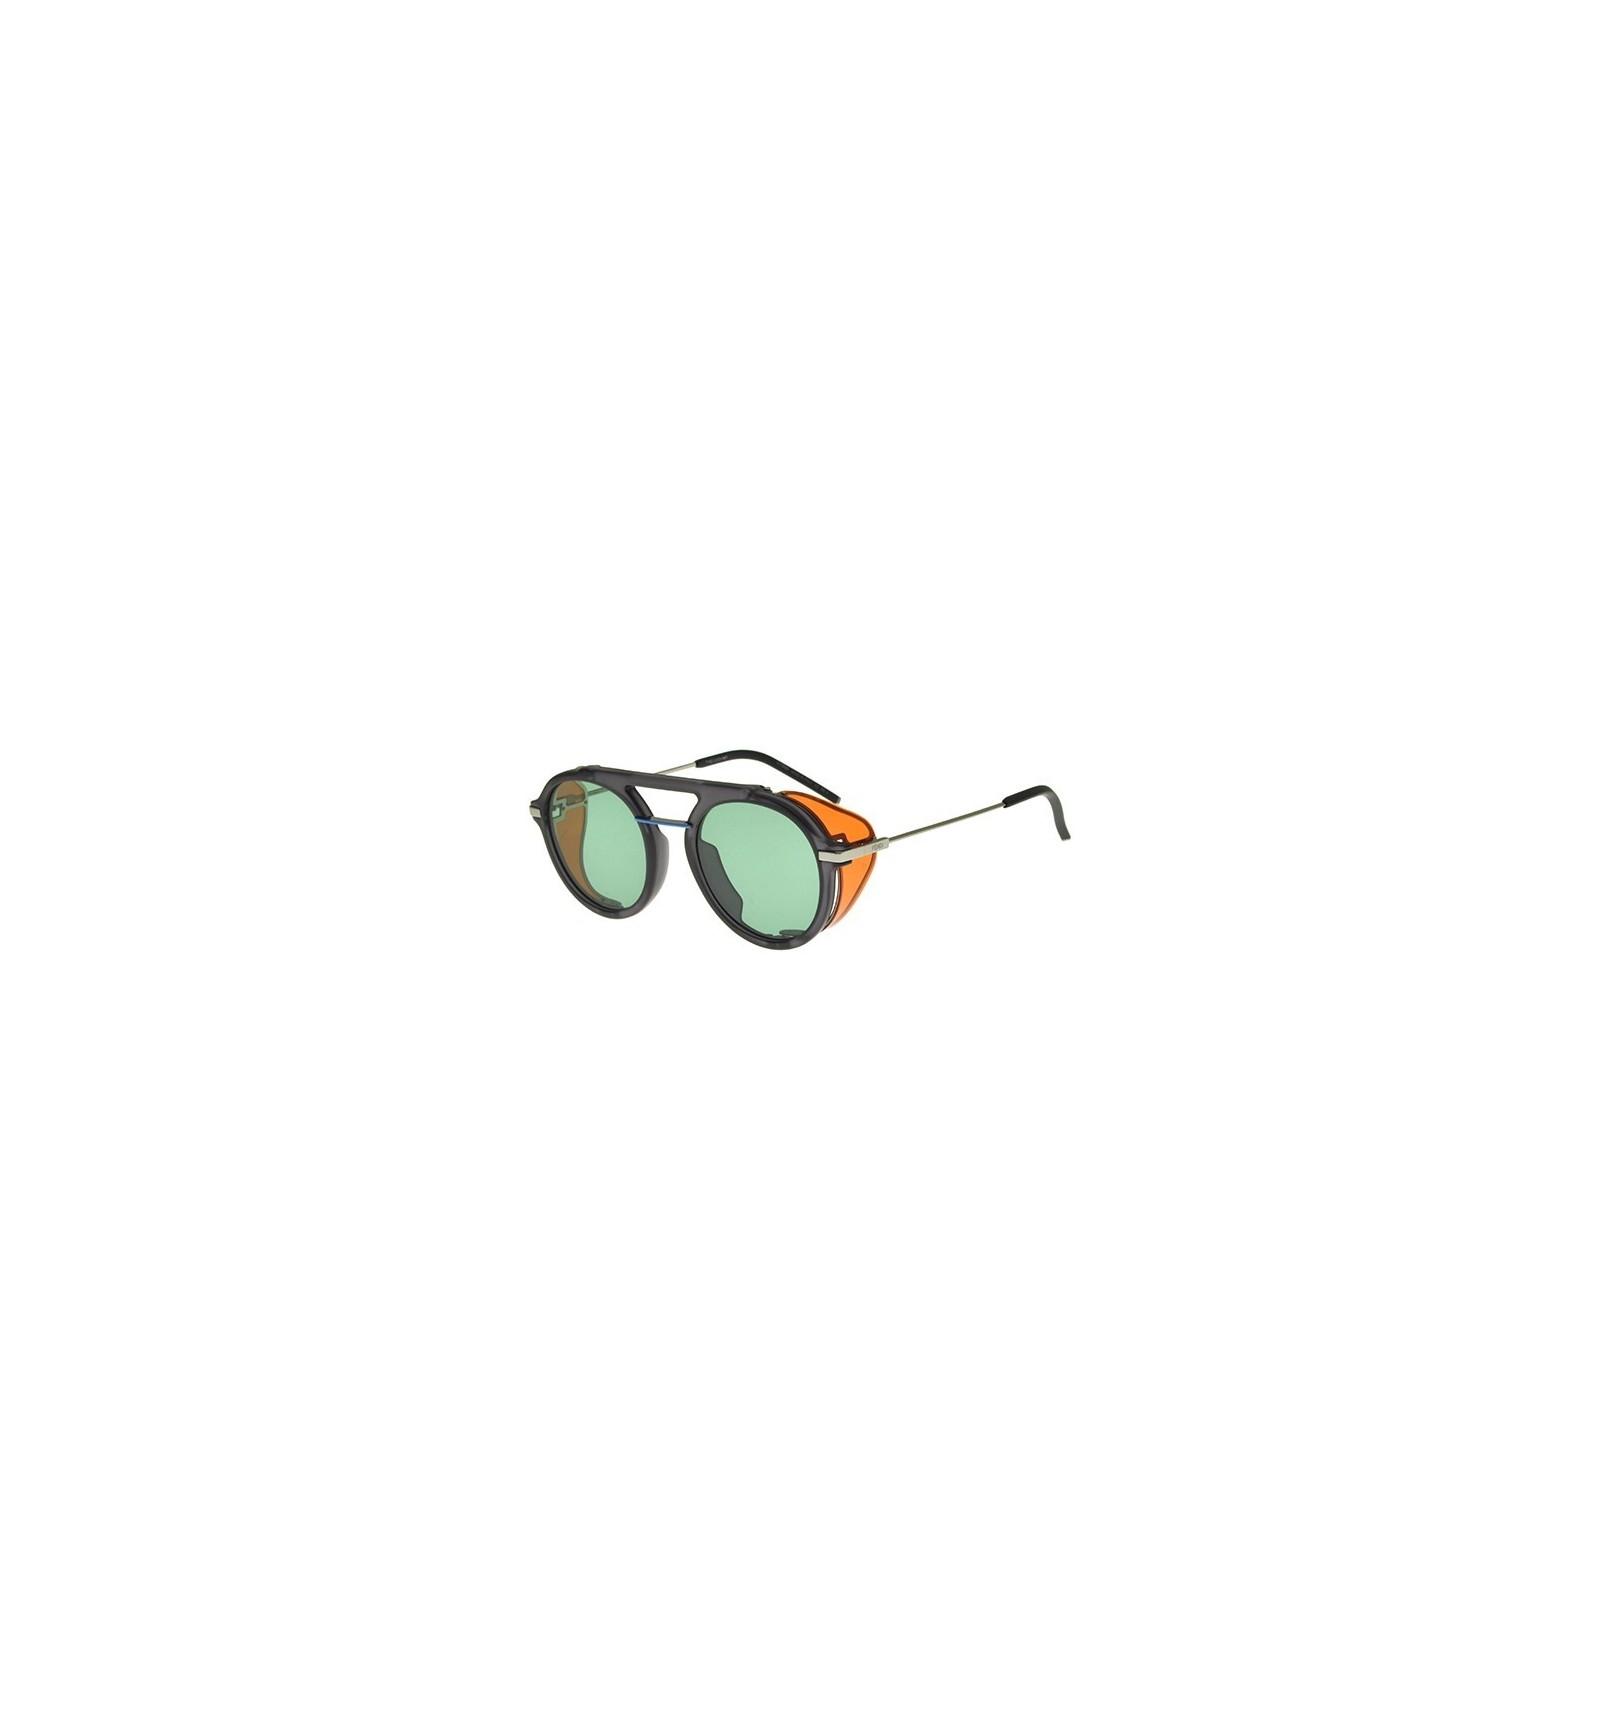 89ca910e3a Gafas de sol Fendi Fantastic Grey Orange - Grey Brown. Compra Online